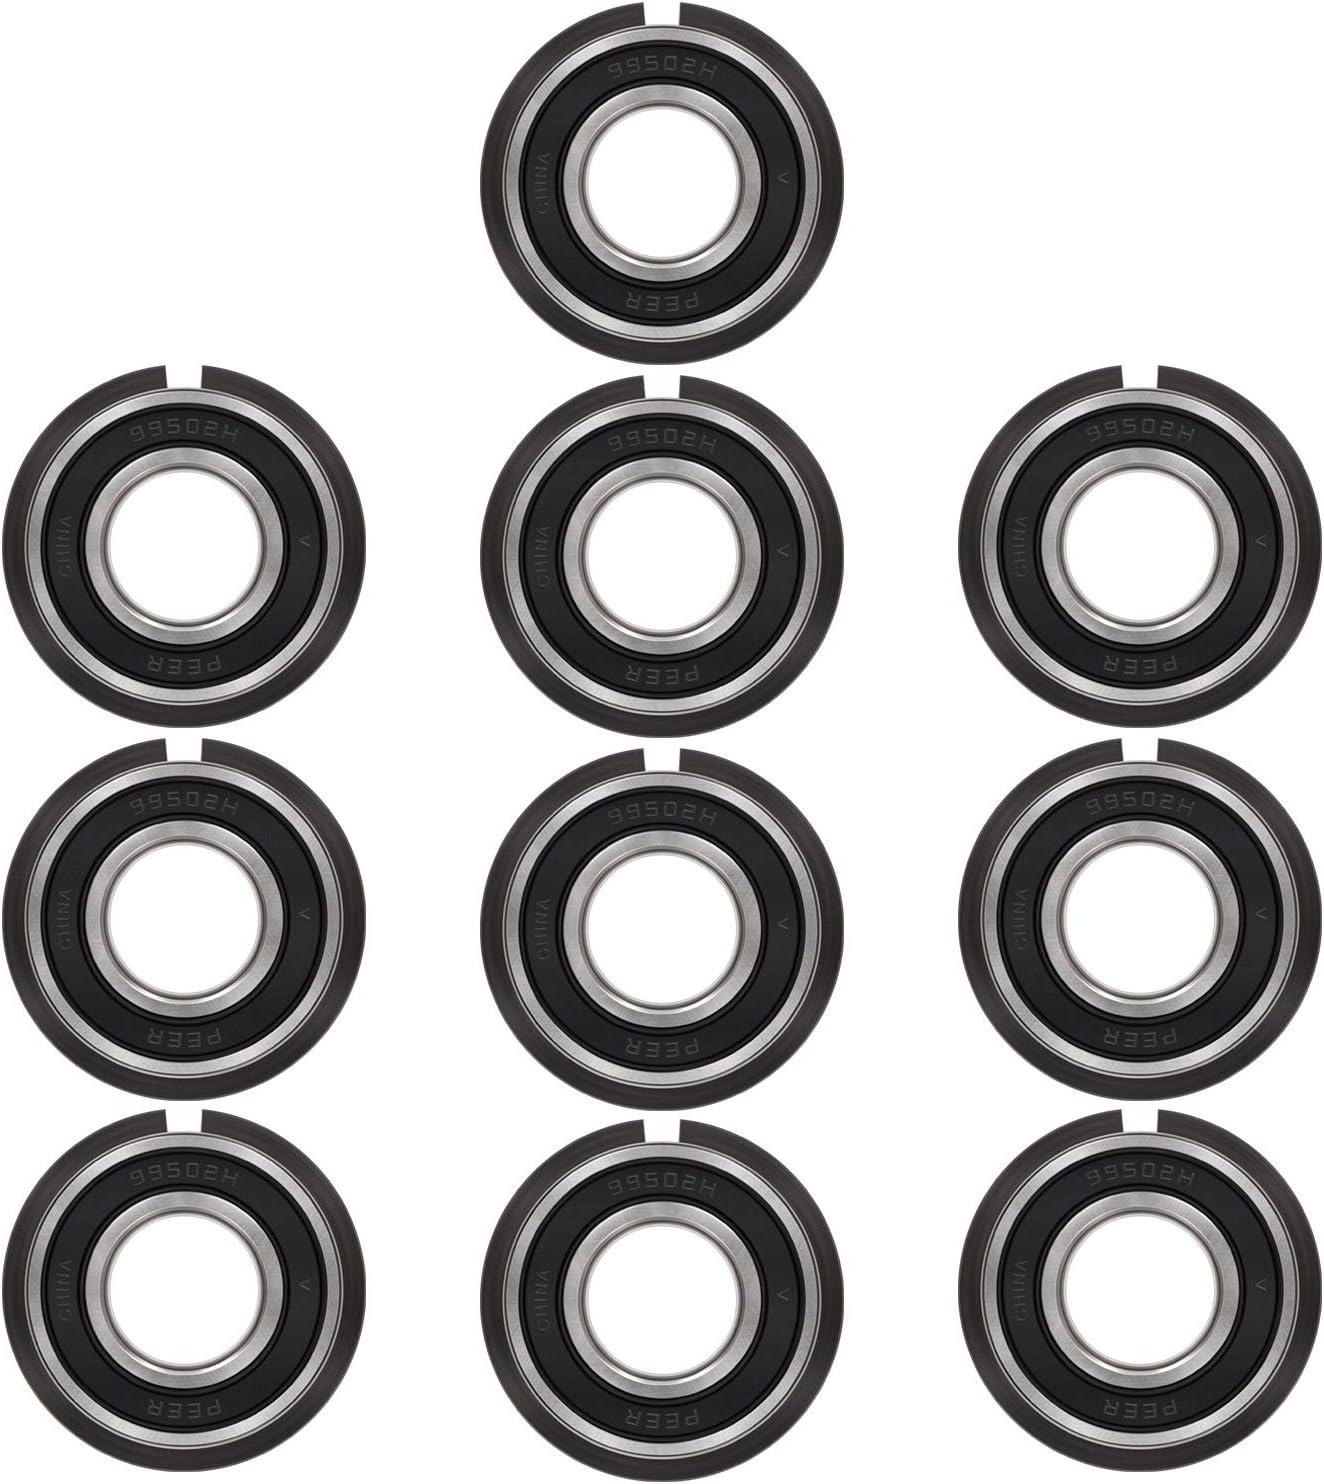 Double Seal 1//2 x 1-1//8 x 1//2 inch Deep Groove Ball Bearings Bonbo 4 Pcs Ball Bearings Wheelbarrows for Lawn Mower Carts and Hand Trucks Wheel Hub